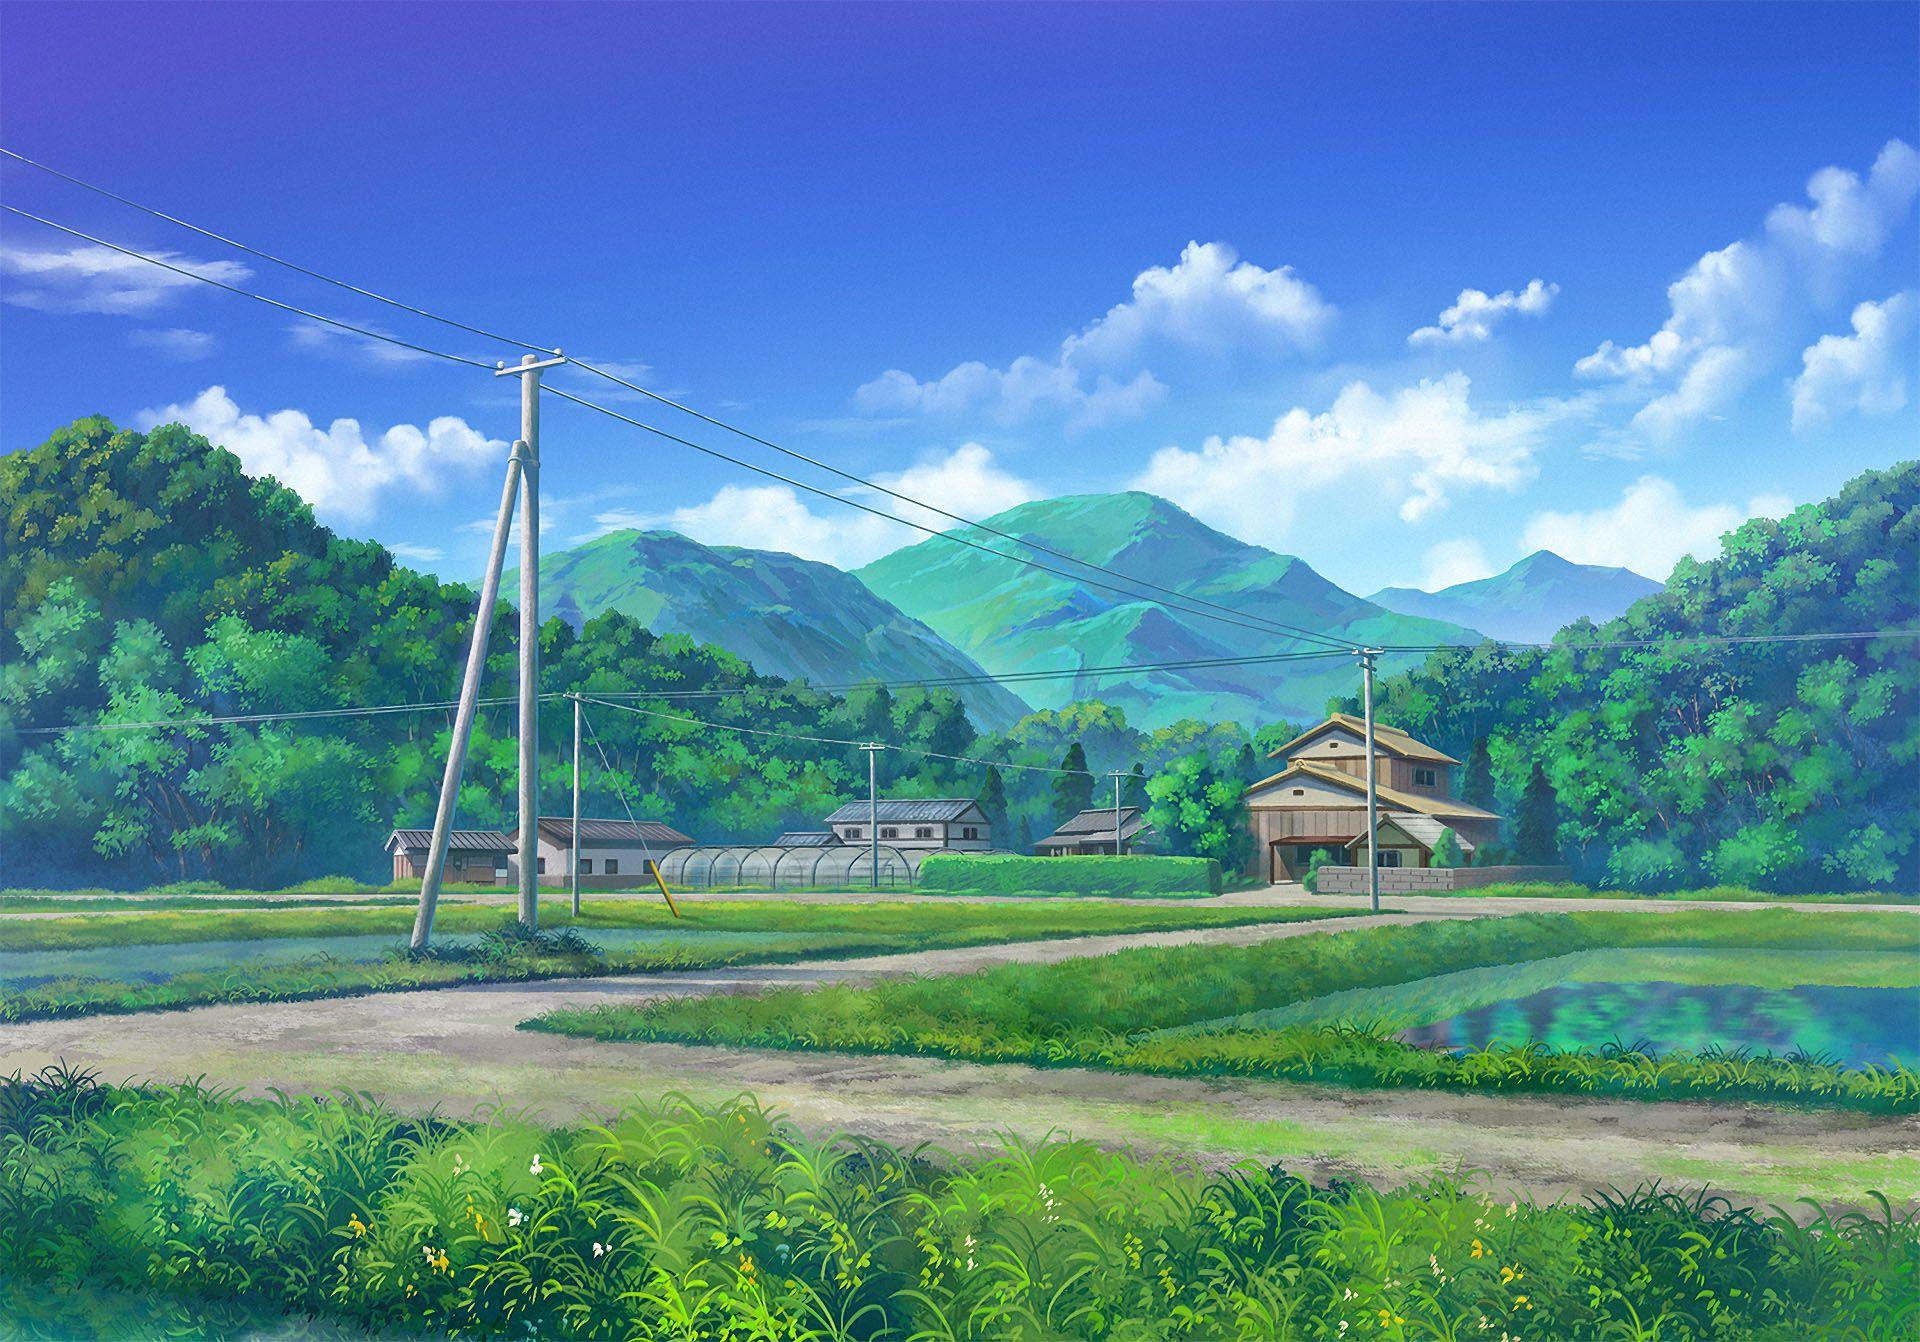 Countryside 1920x1342 Scenery Background Anime Scenery Scenery Wallpaper